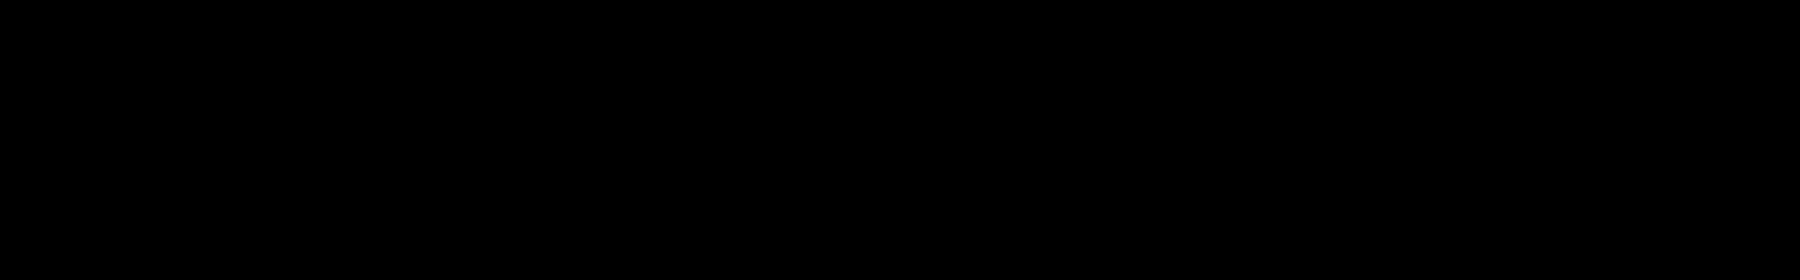 Dark Energy audio waveform